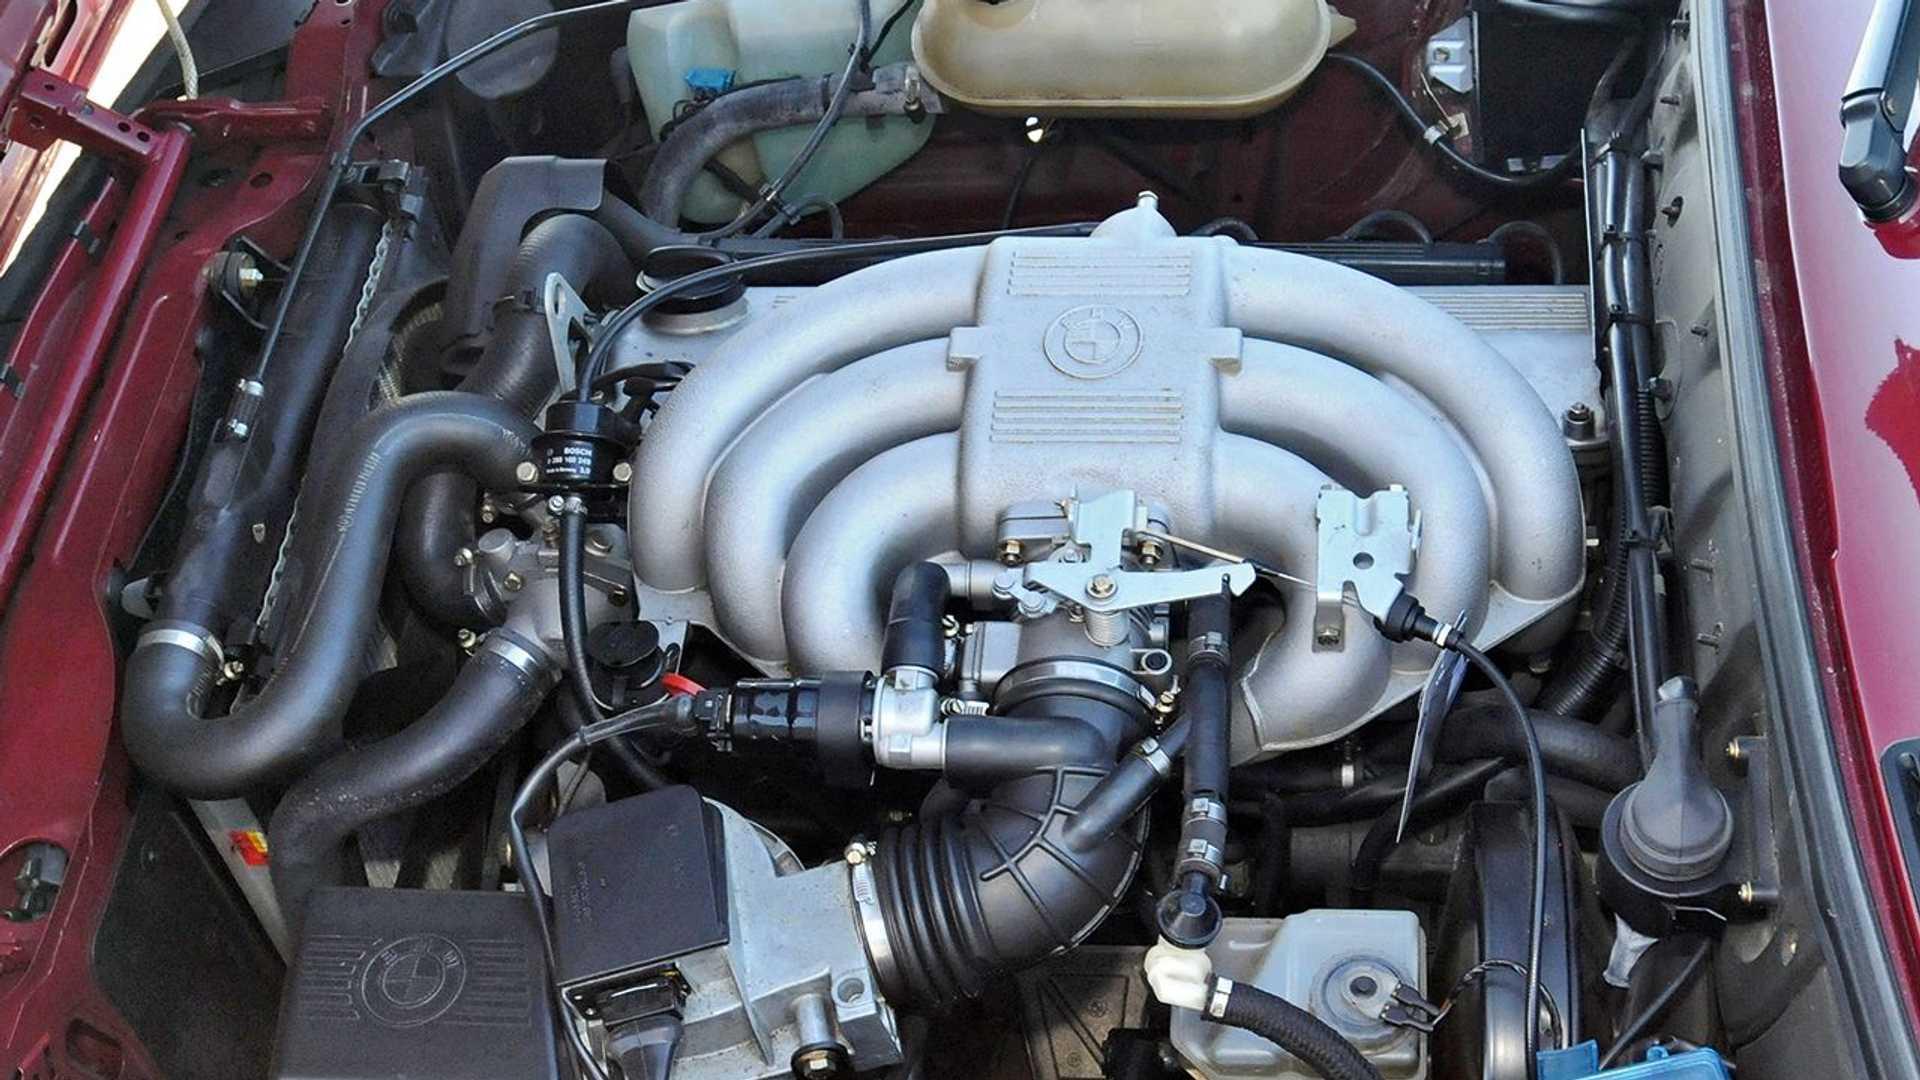 https://cdn.motor1.com/images/mgl/z6BGq/s6/i-motori-6-cilindri-m20-di-bmw.jpg